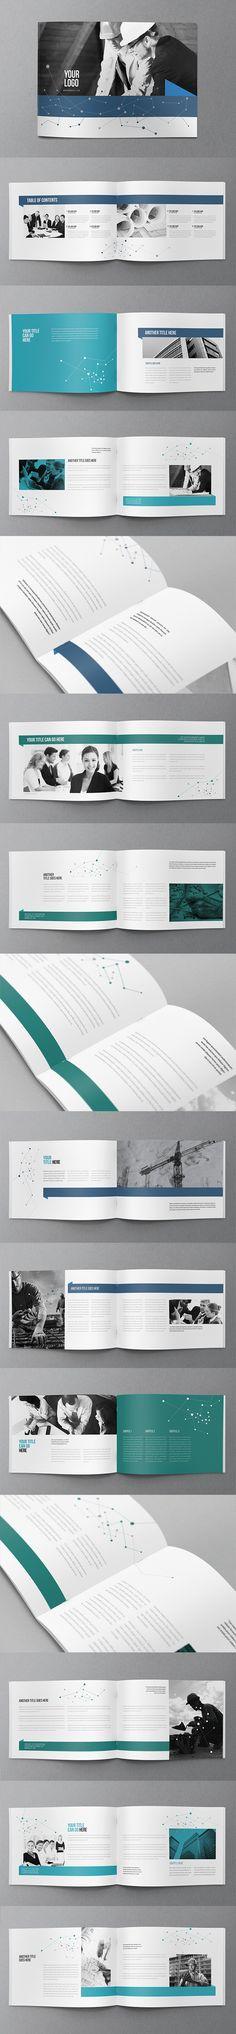 Modern Blue Business Brochure. Download here: http://graphicriver.net/item/modern-blue-business-brochure/10823477?ref=abradesign #brochure #design